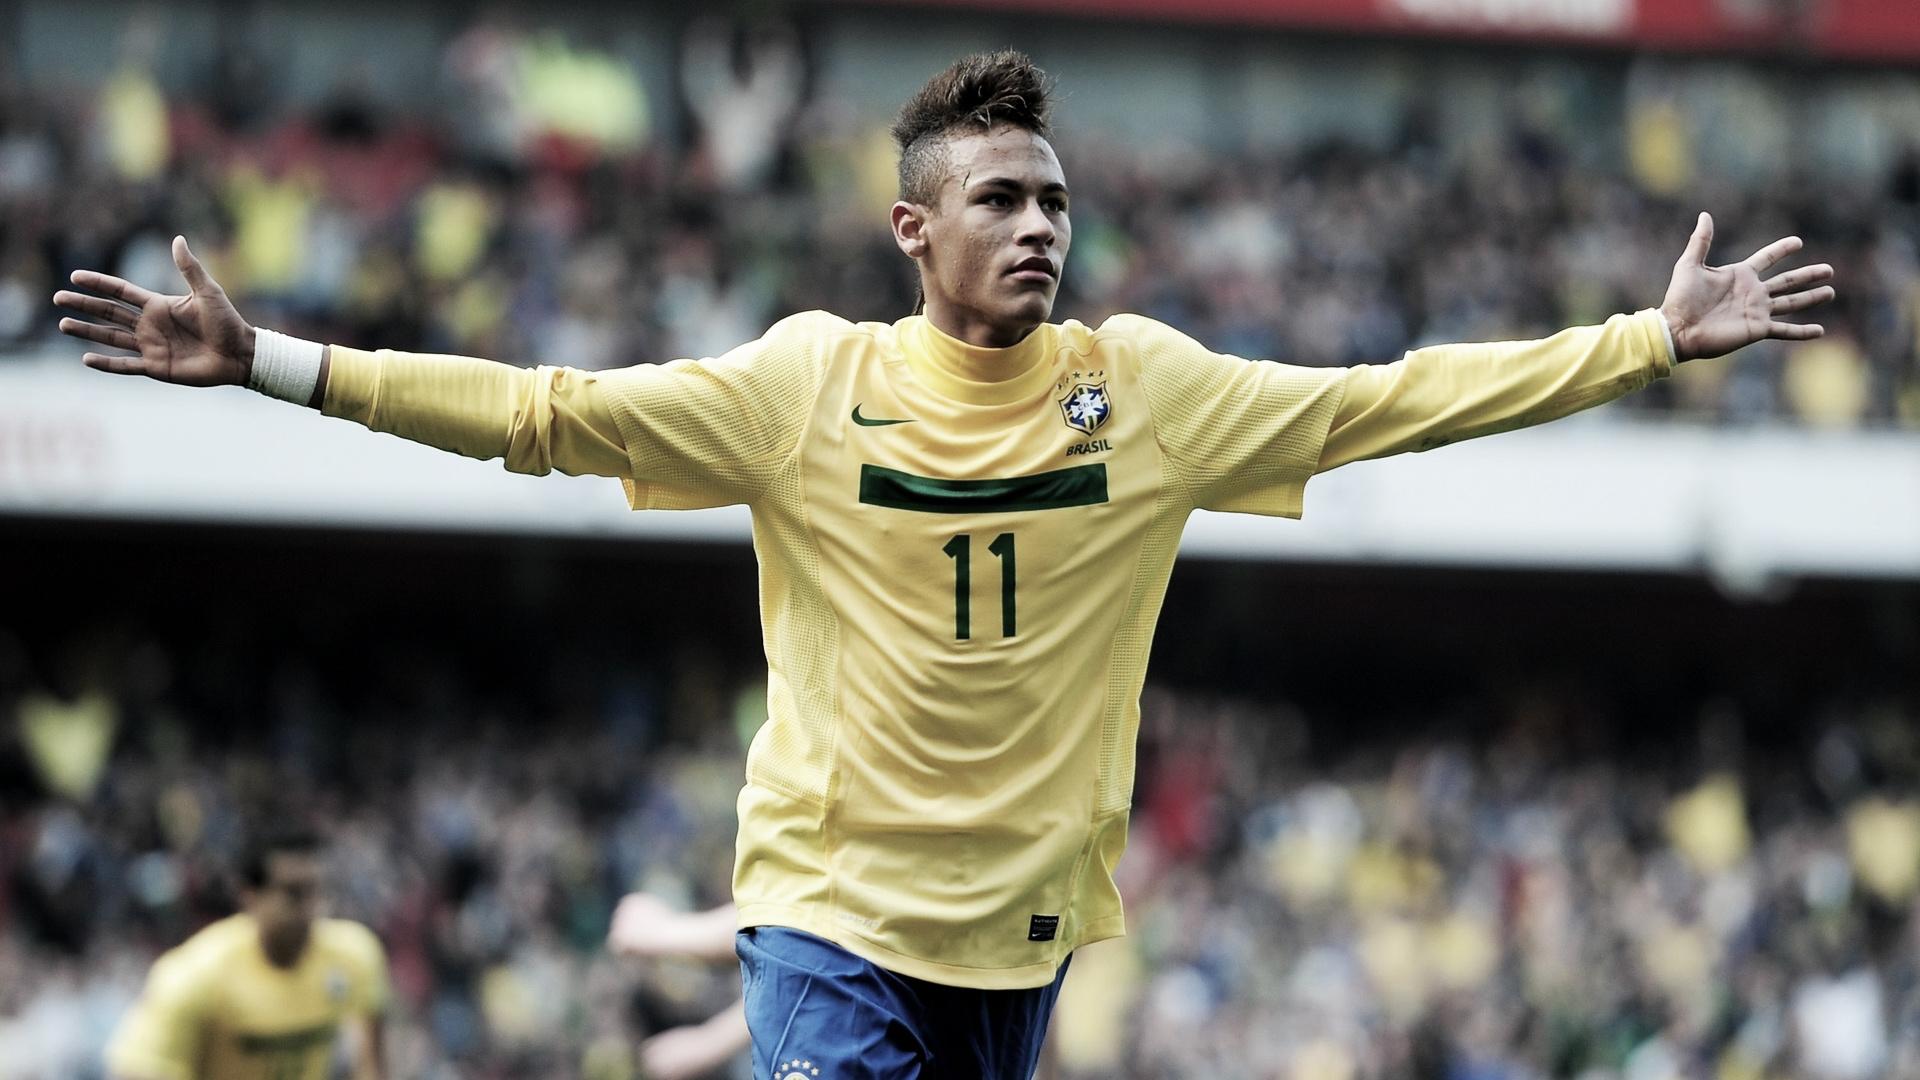 Officiel: Neymar annonce son transfert à Barcelone